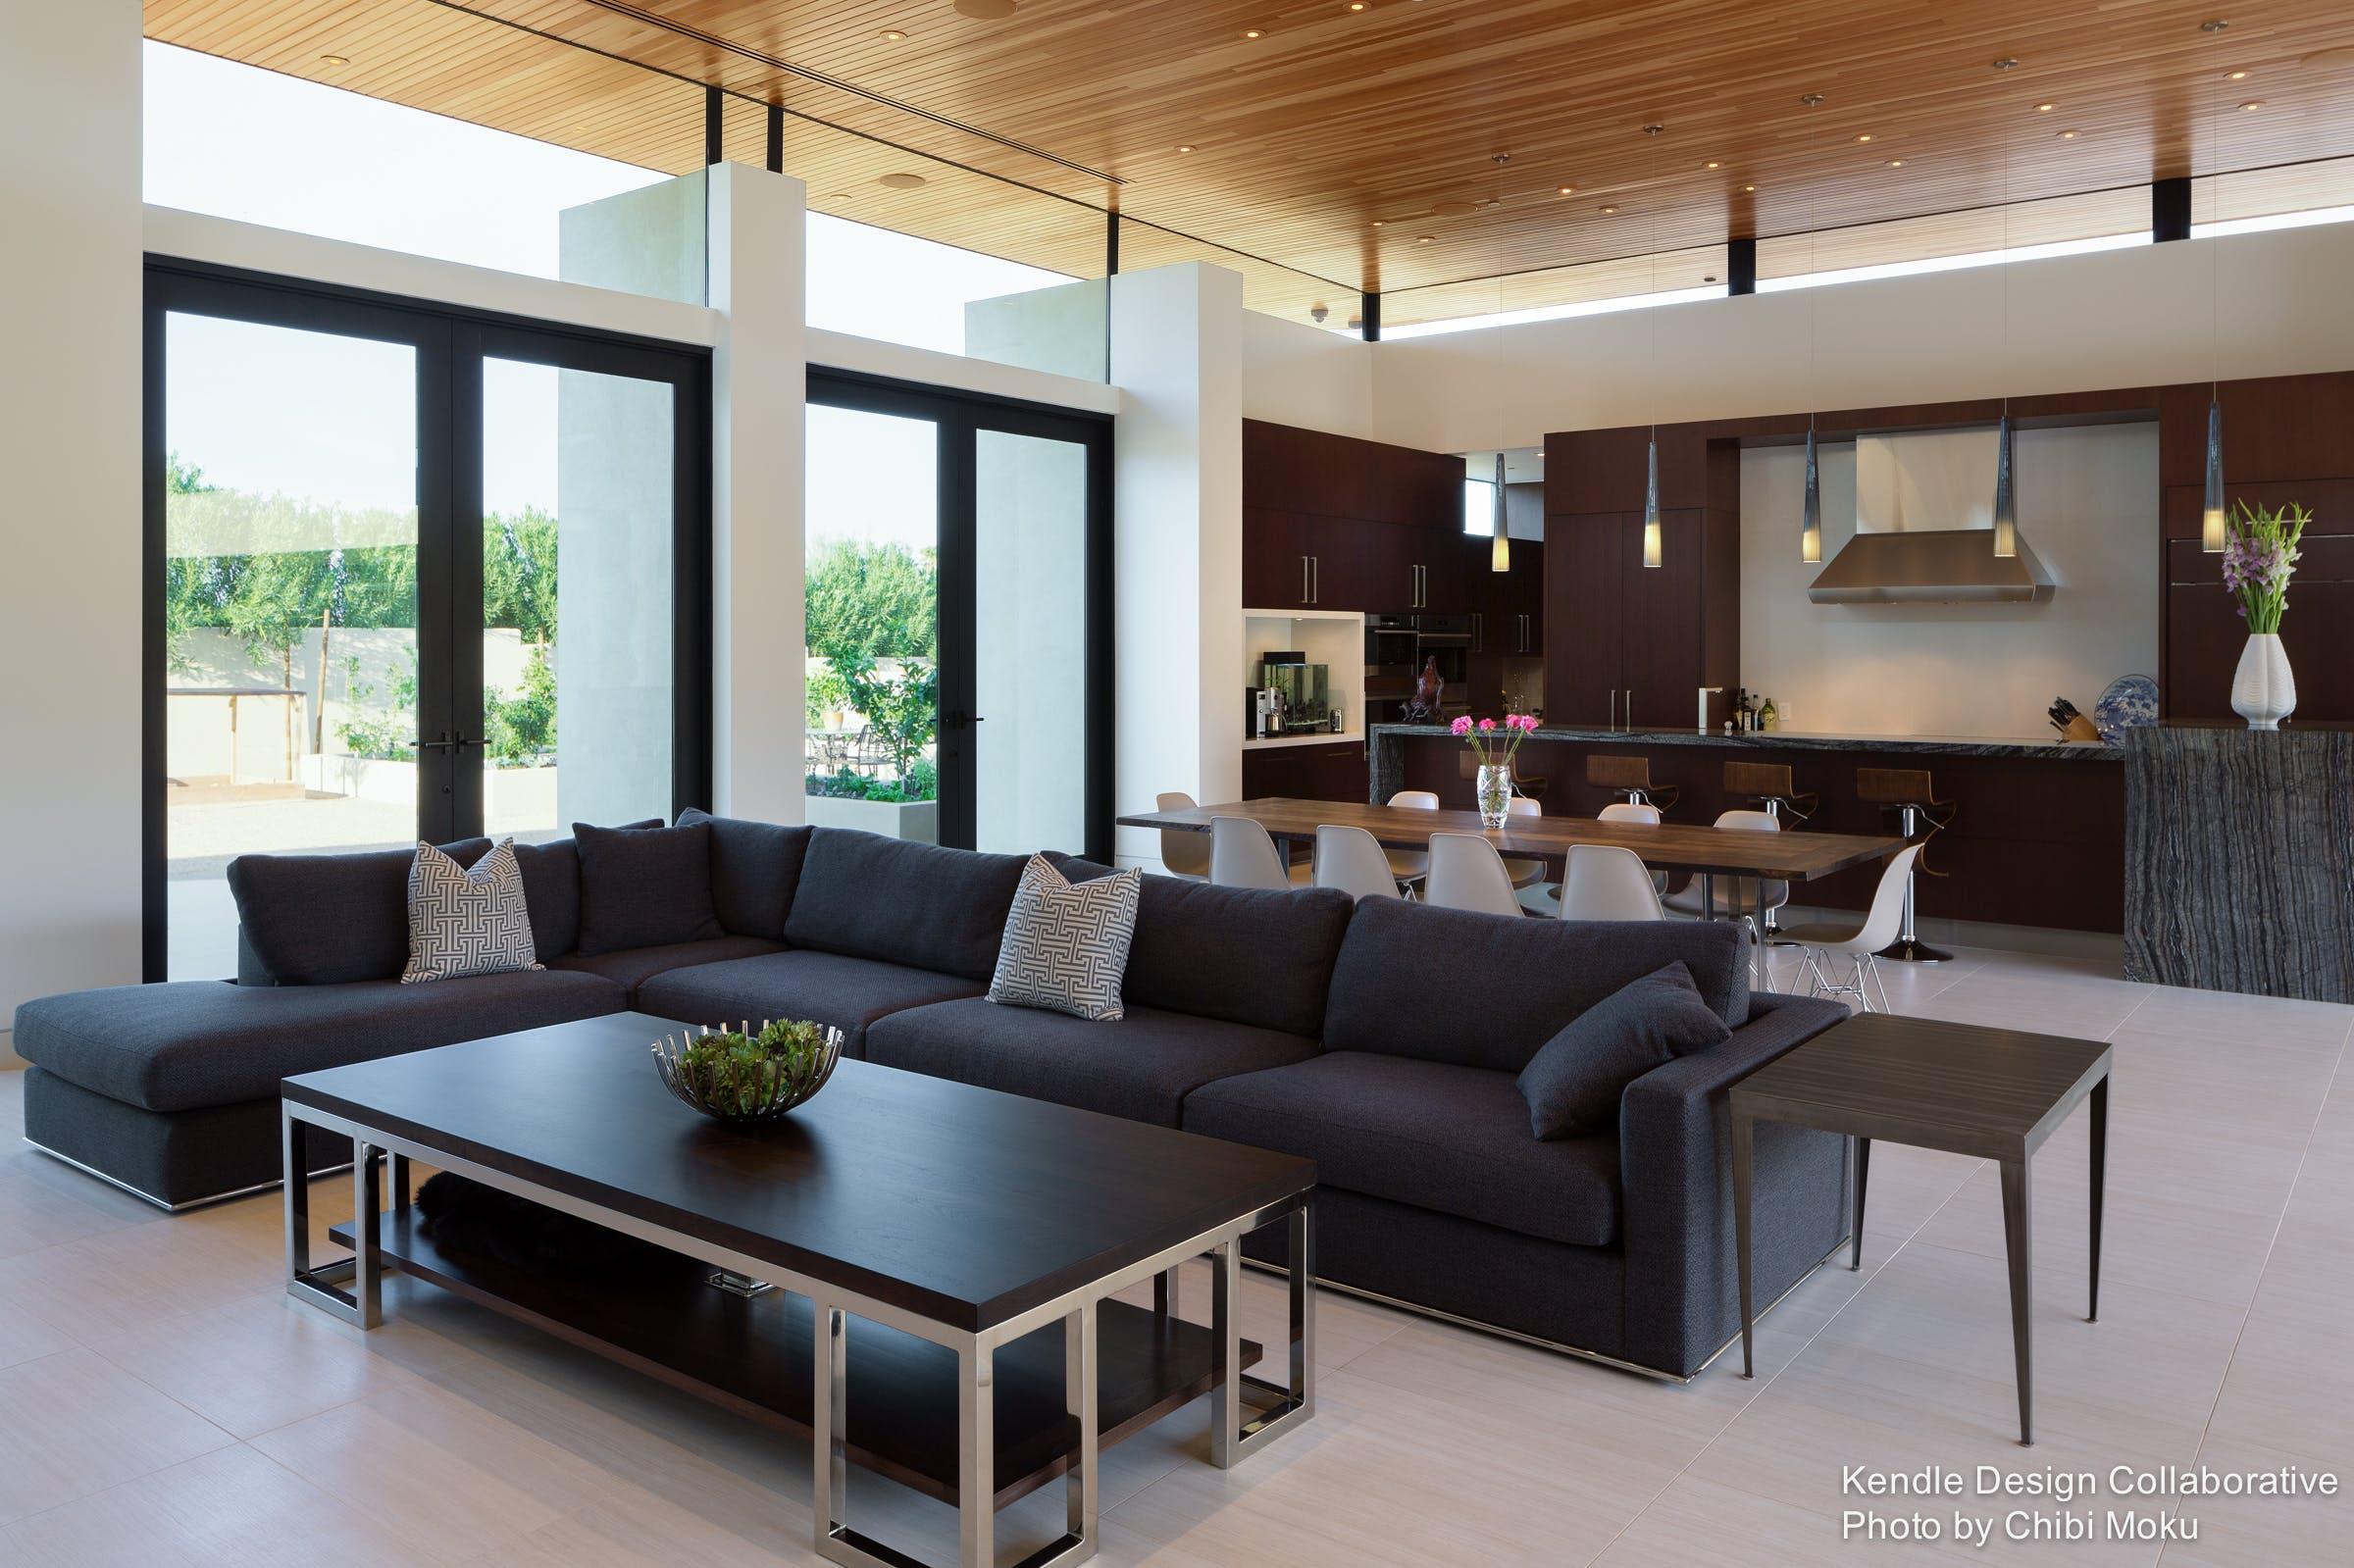 House design documentary - Landscape Design Videography Interior Design Cinematographer Hotel Photography Landscape Videographer Interior Design